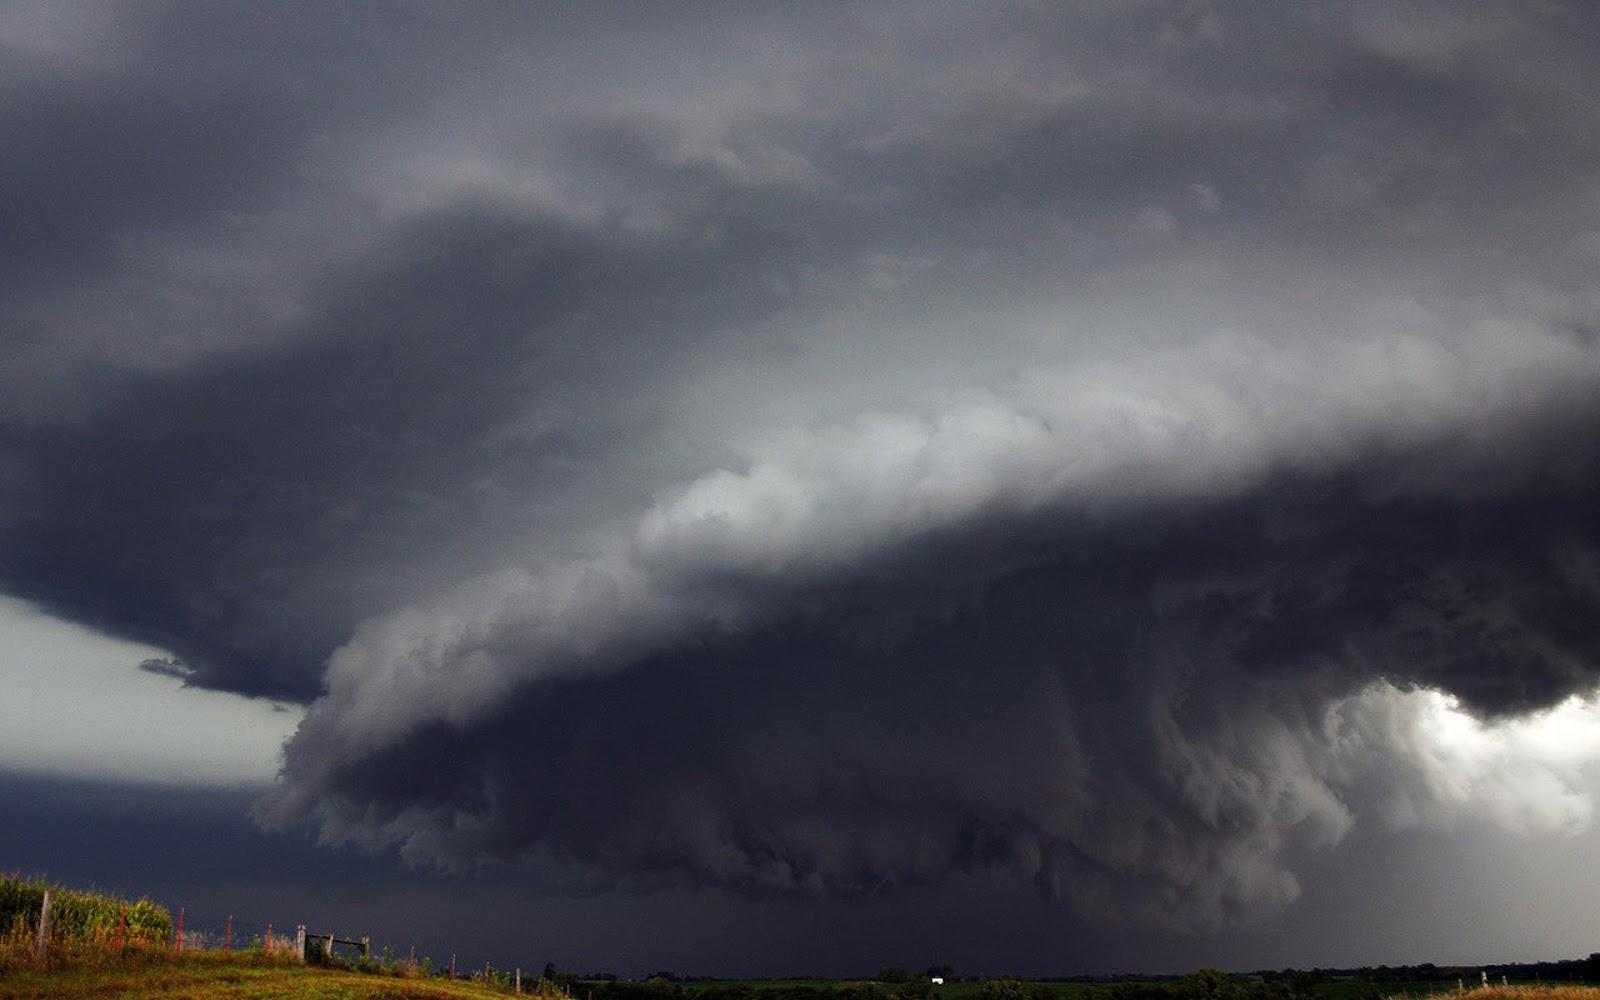 Red Dead Redemption Wallpaper Hd Tornados Im 225 Genes De Tornados Fotos